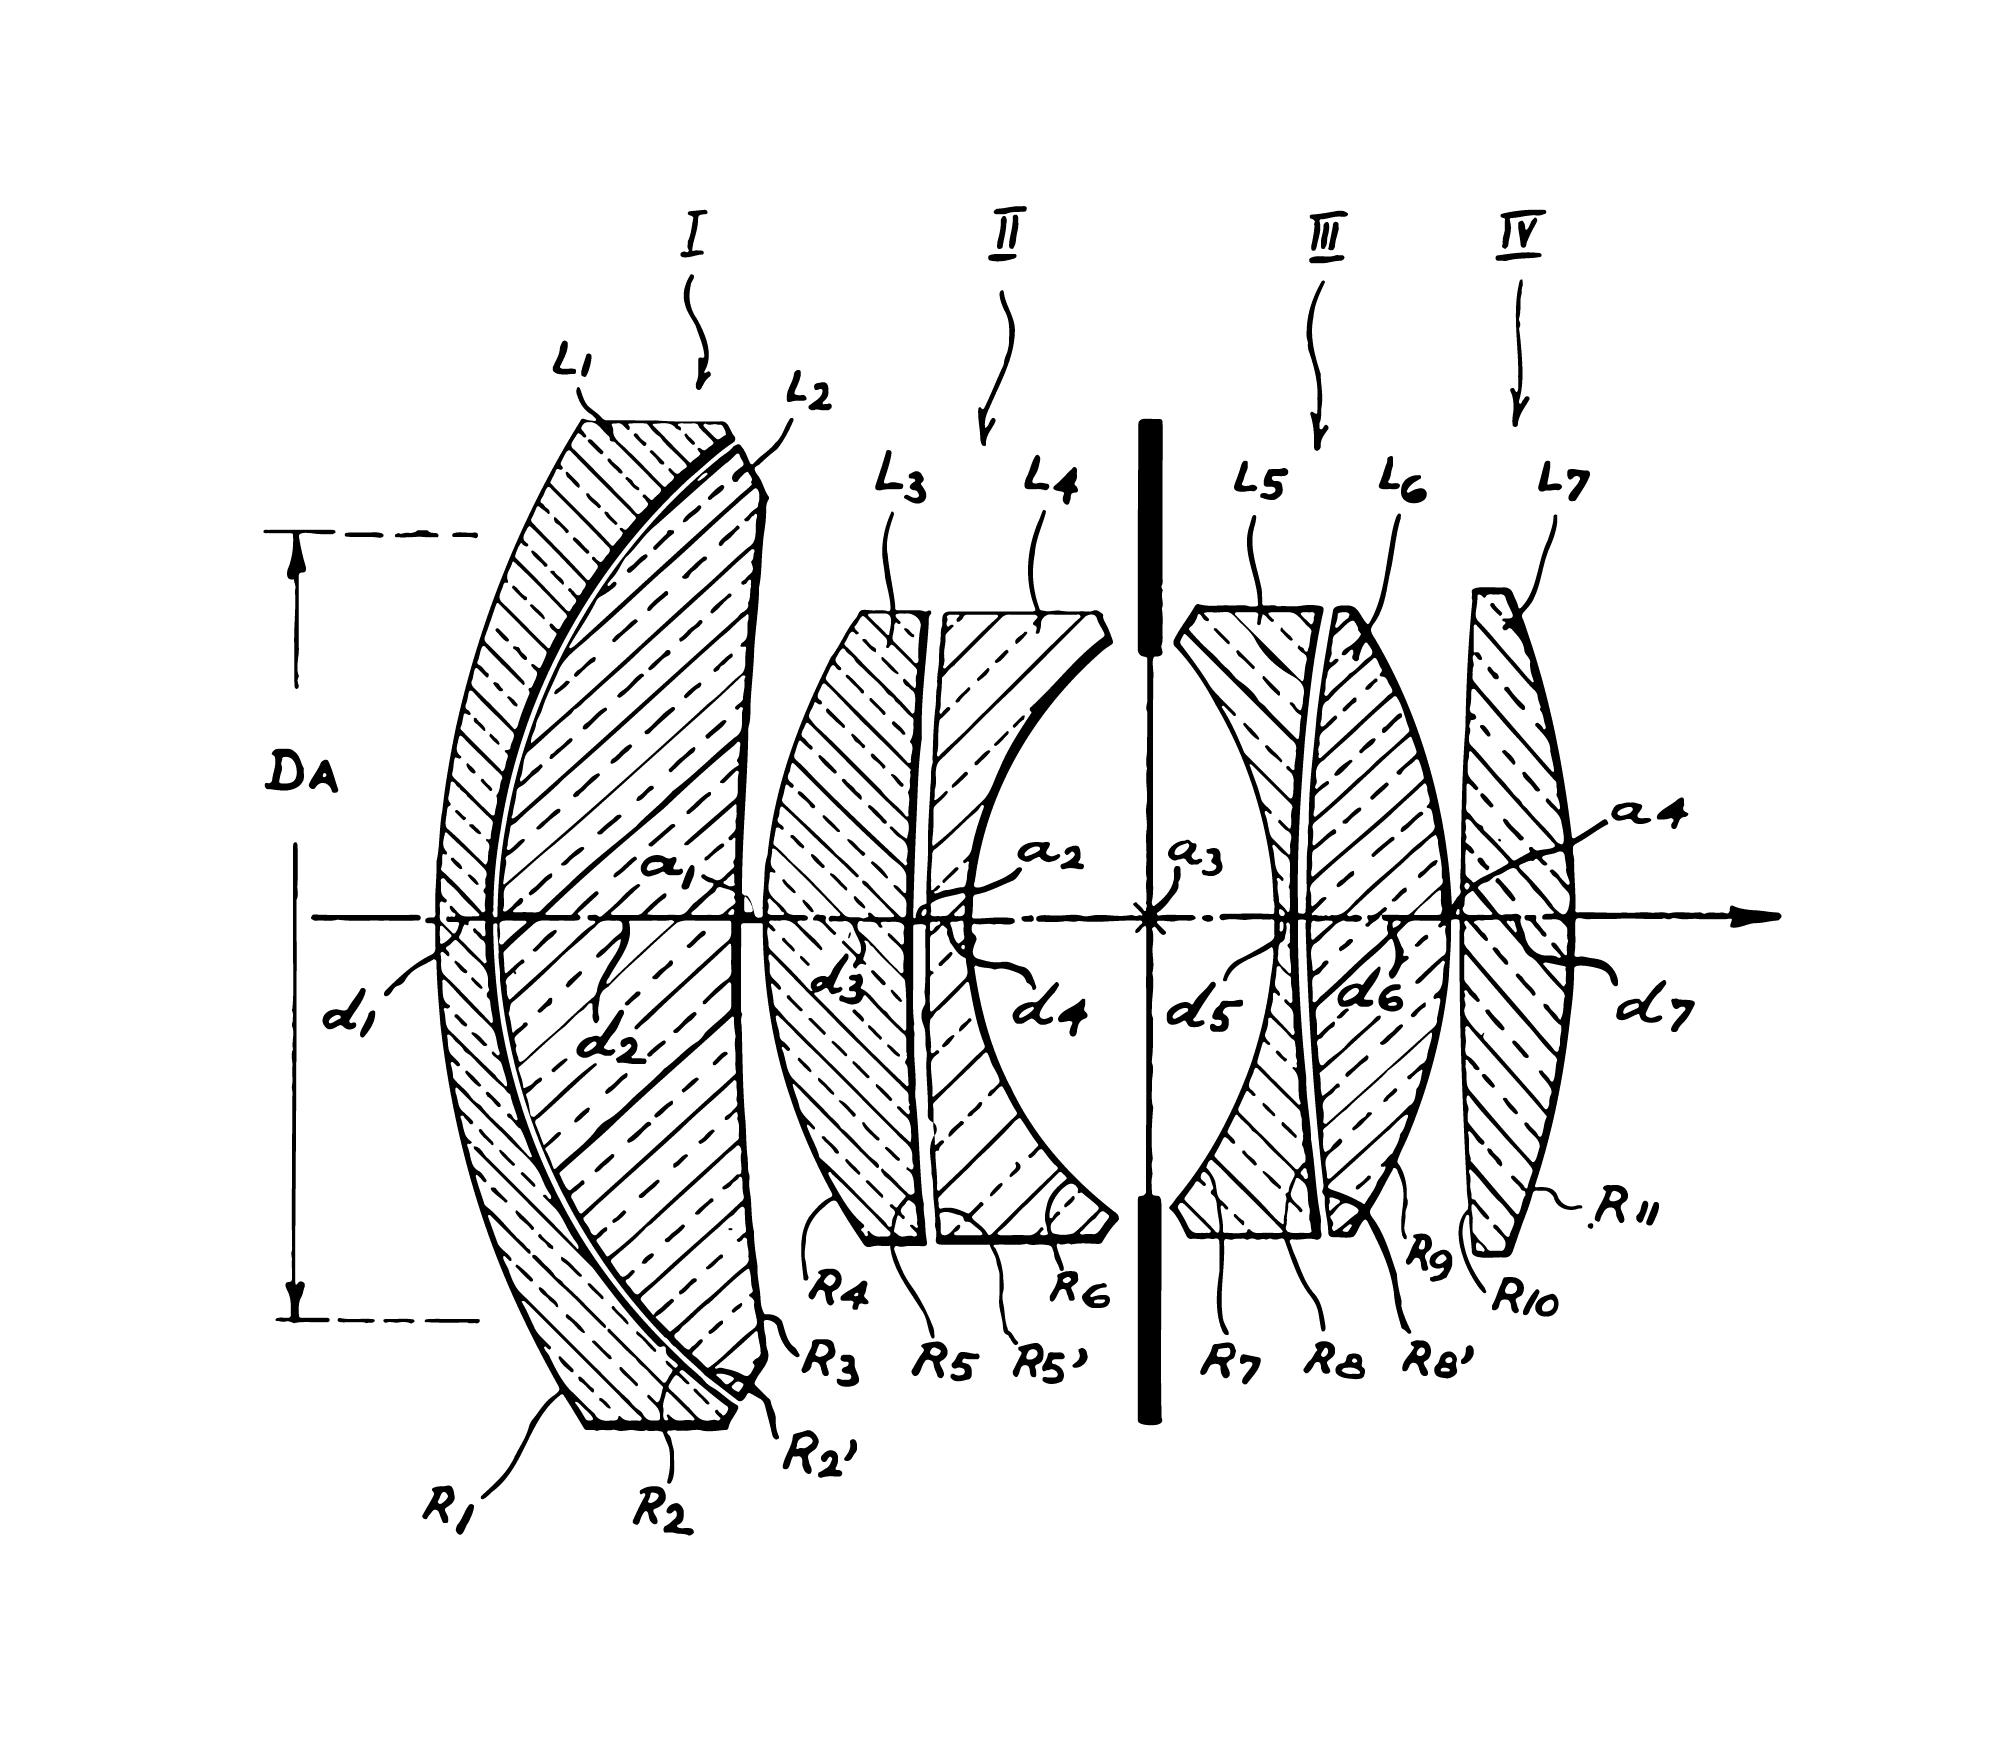 Patent diagram of the Nokton 50mm f1.5